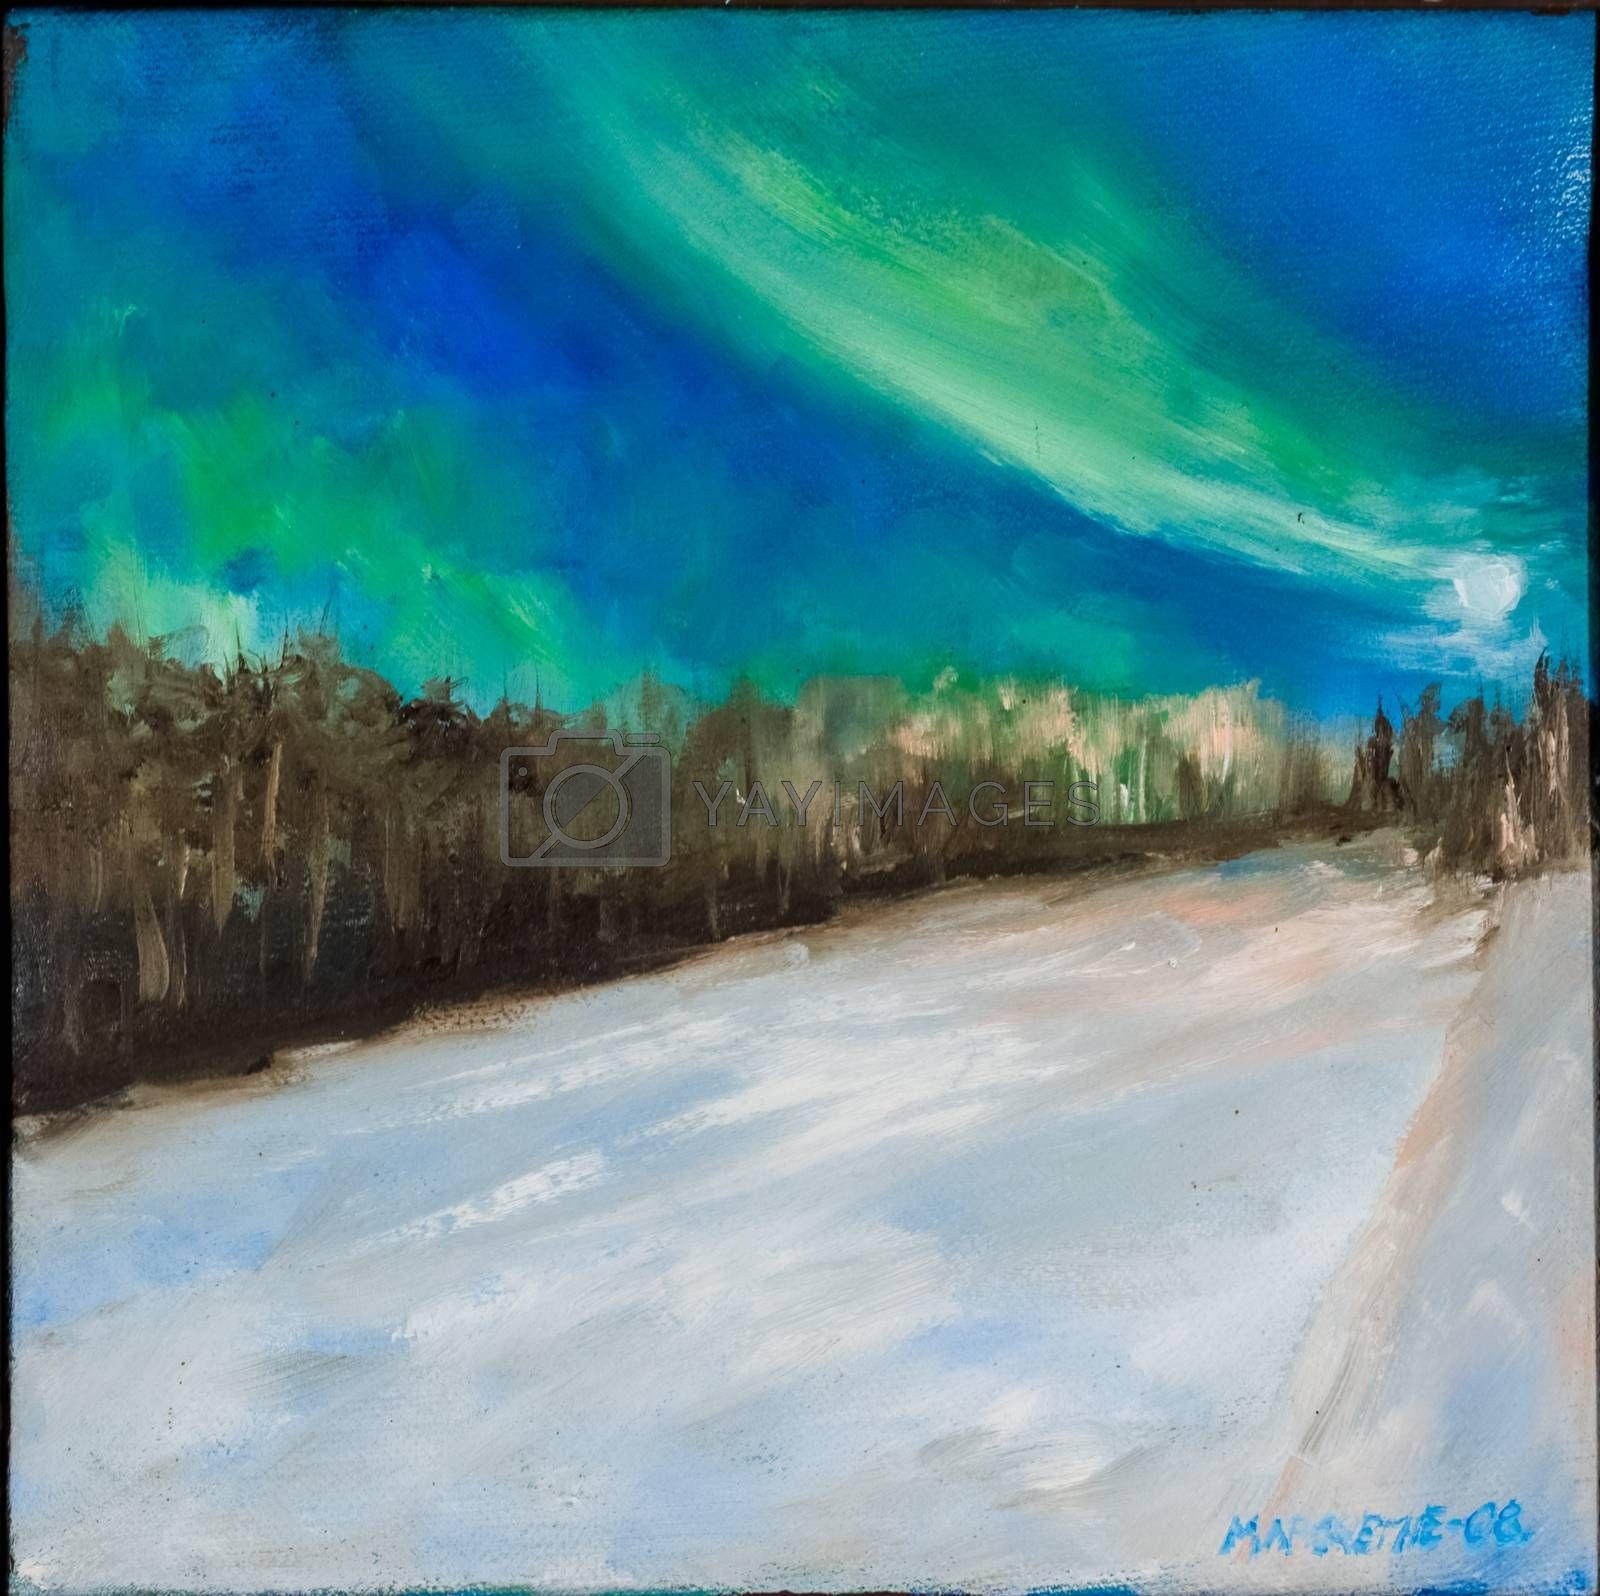 Northern light in Svanvik, Pasvikdalen, Finnmark, Norway. Oil painting based on a photo.